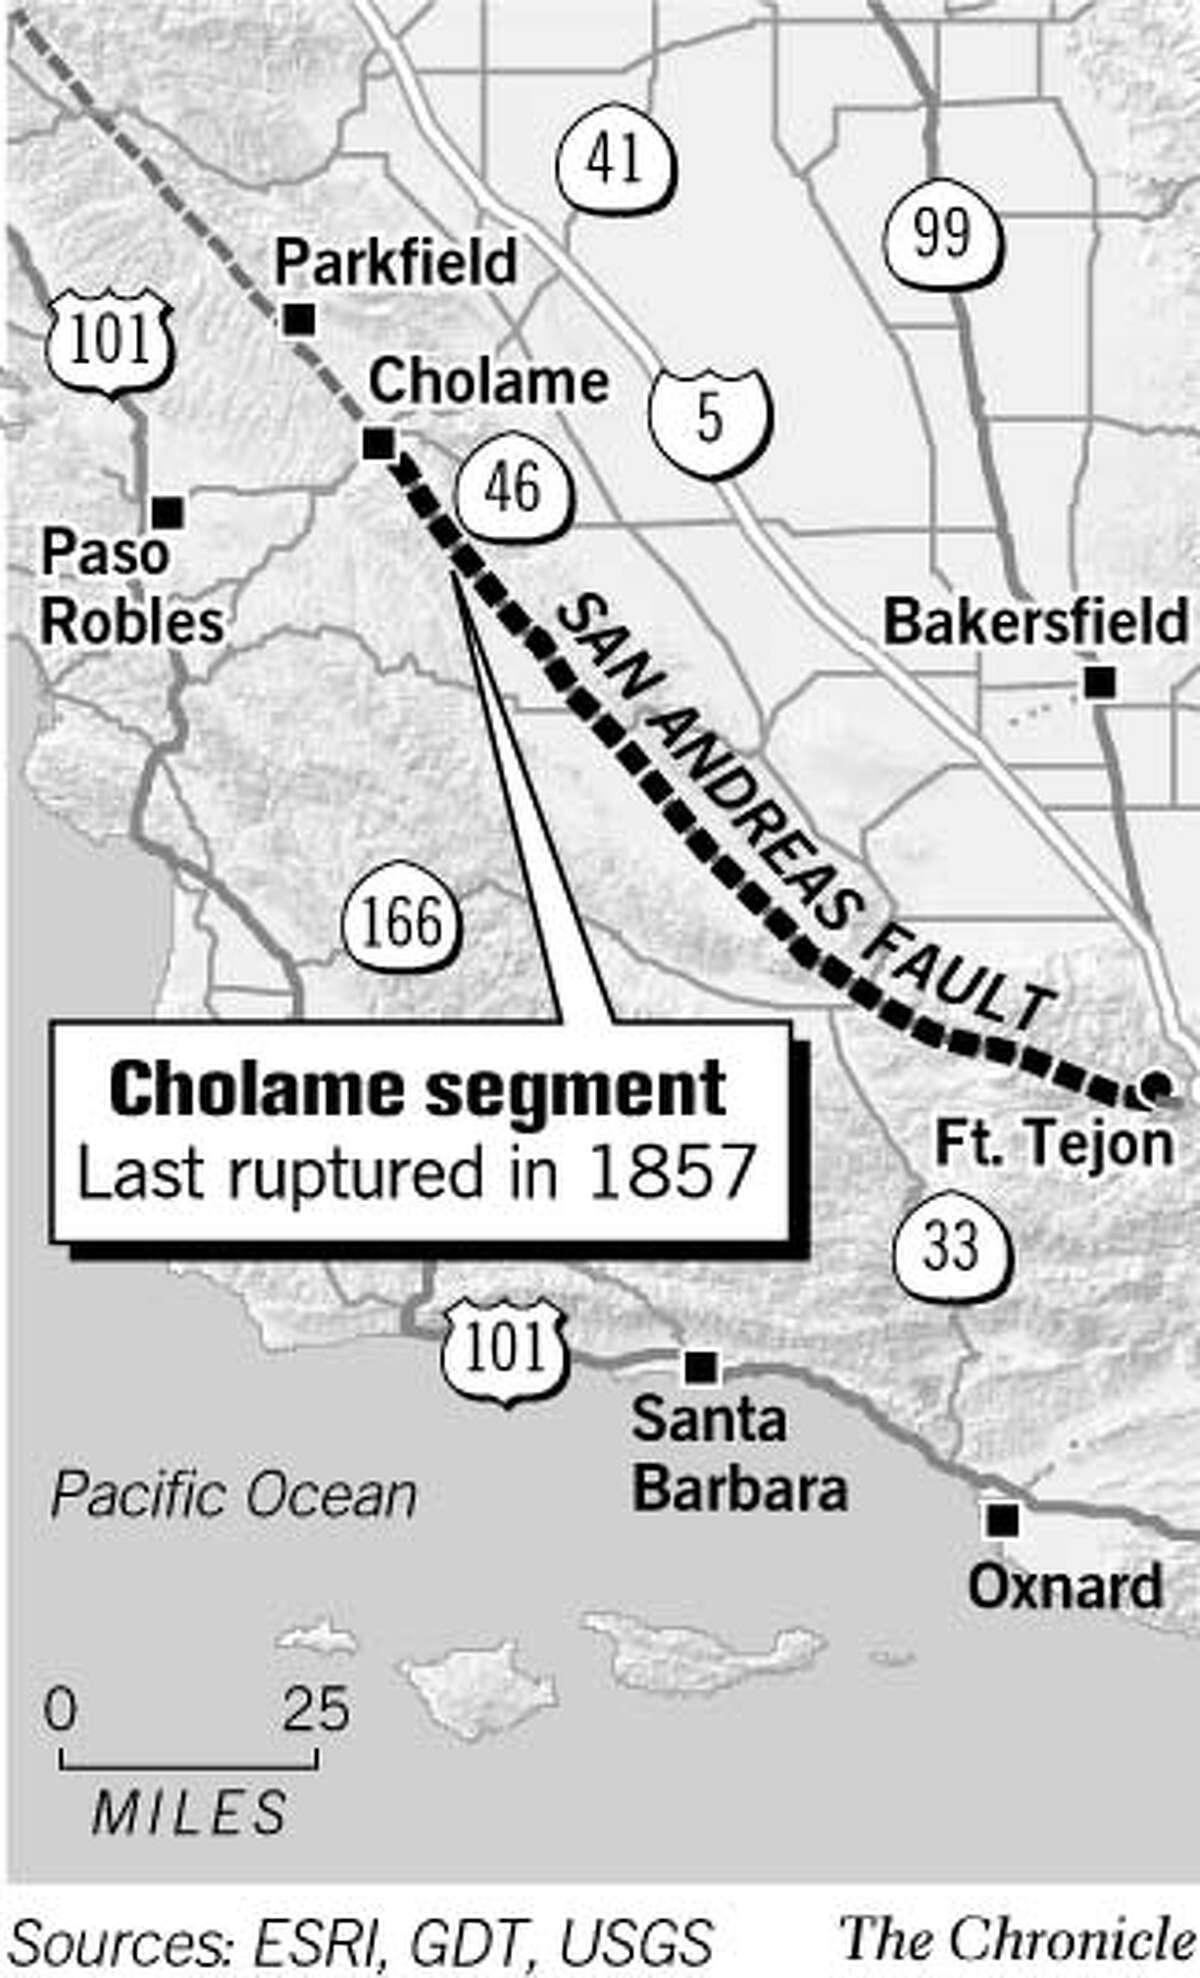 Cholame Segment. Chronicle Graphic